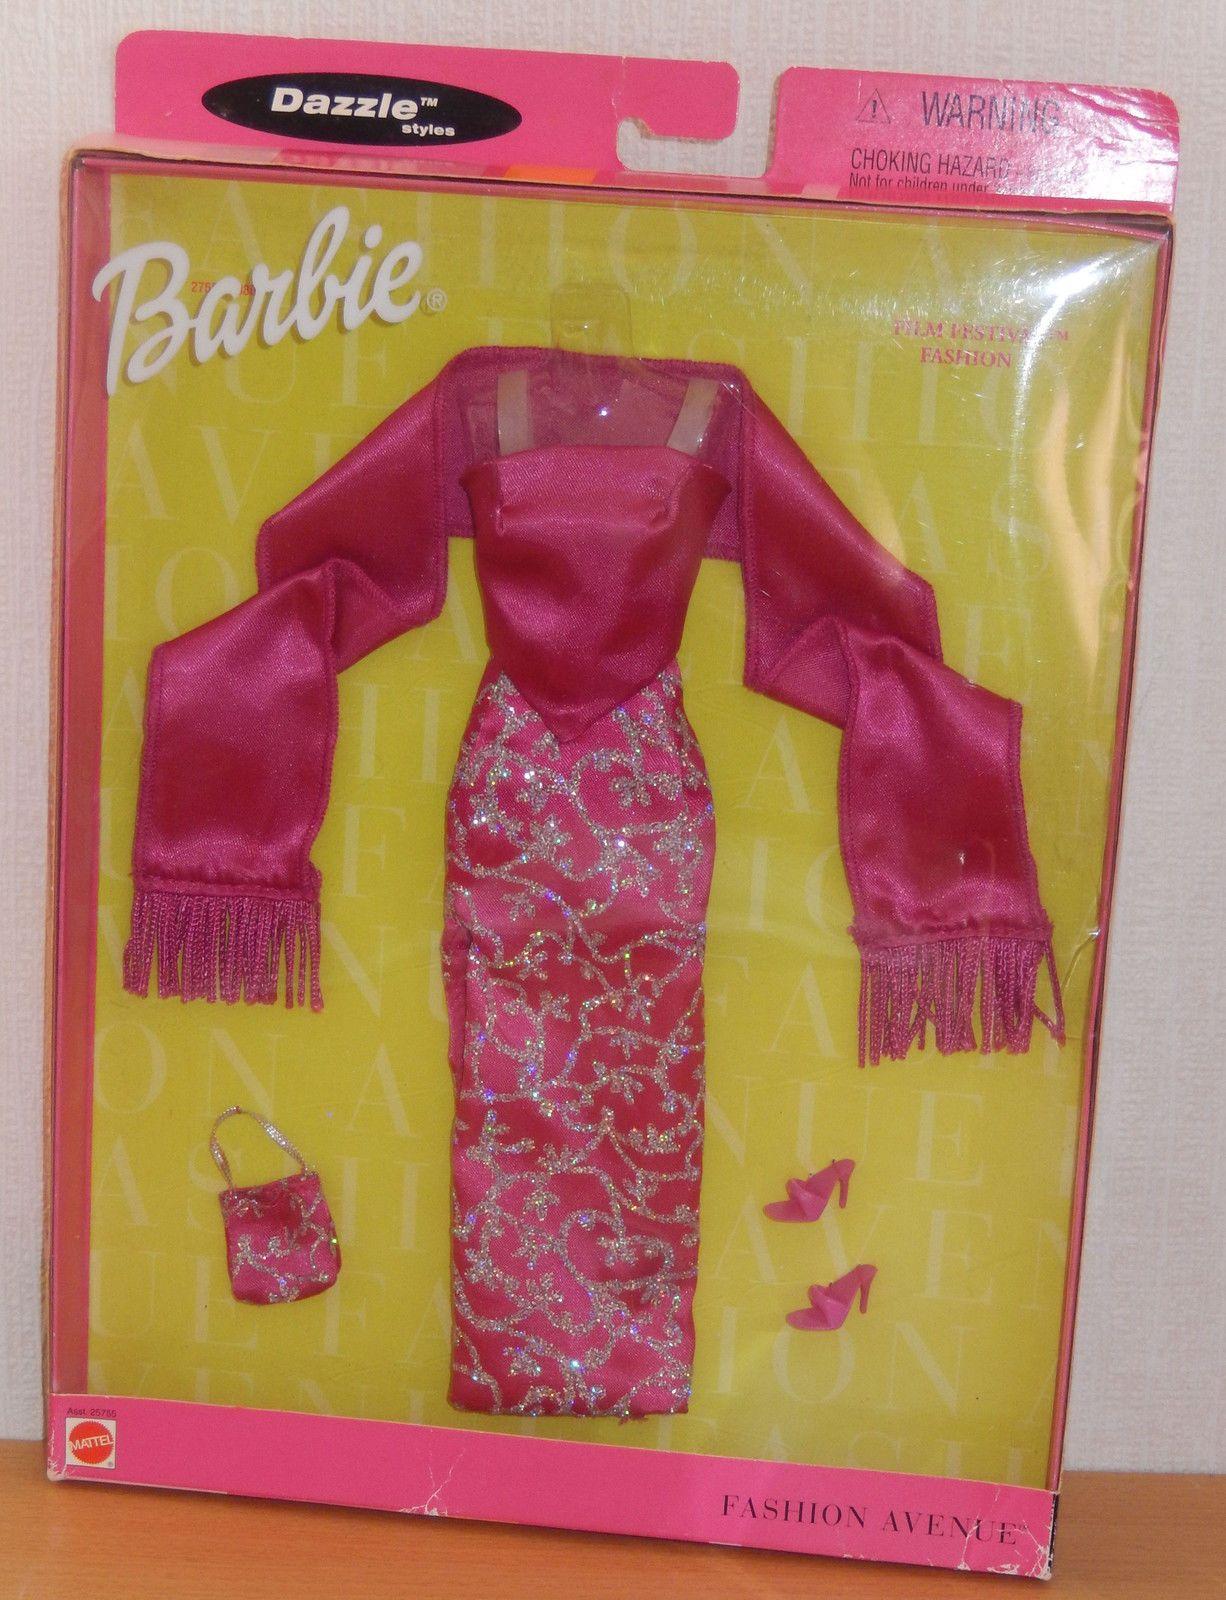 Barbie fashion avenue pink dress outfit